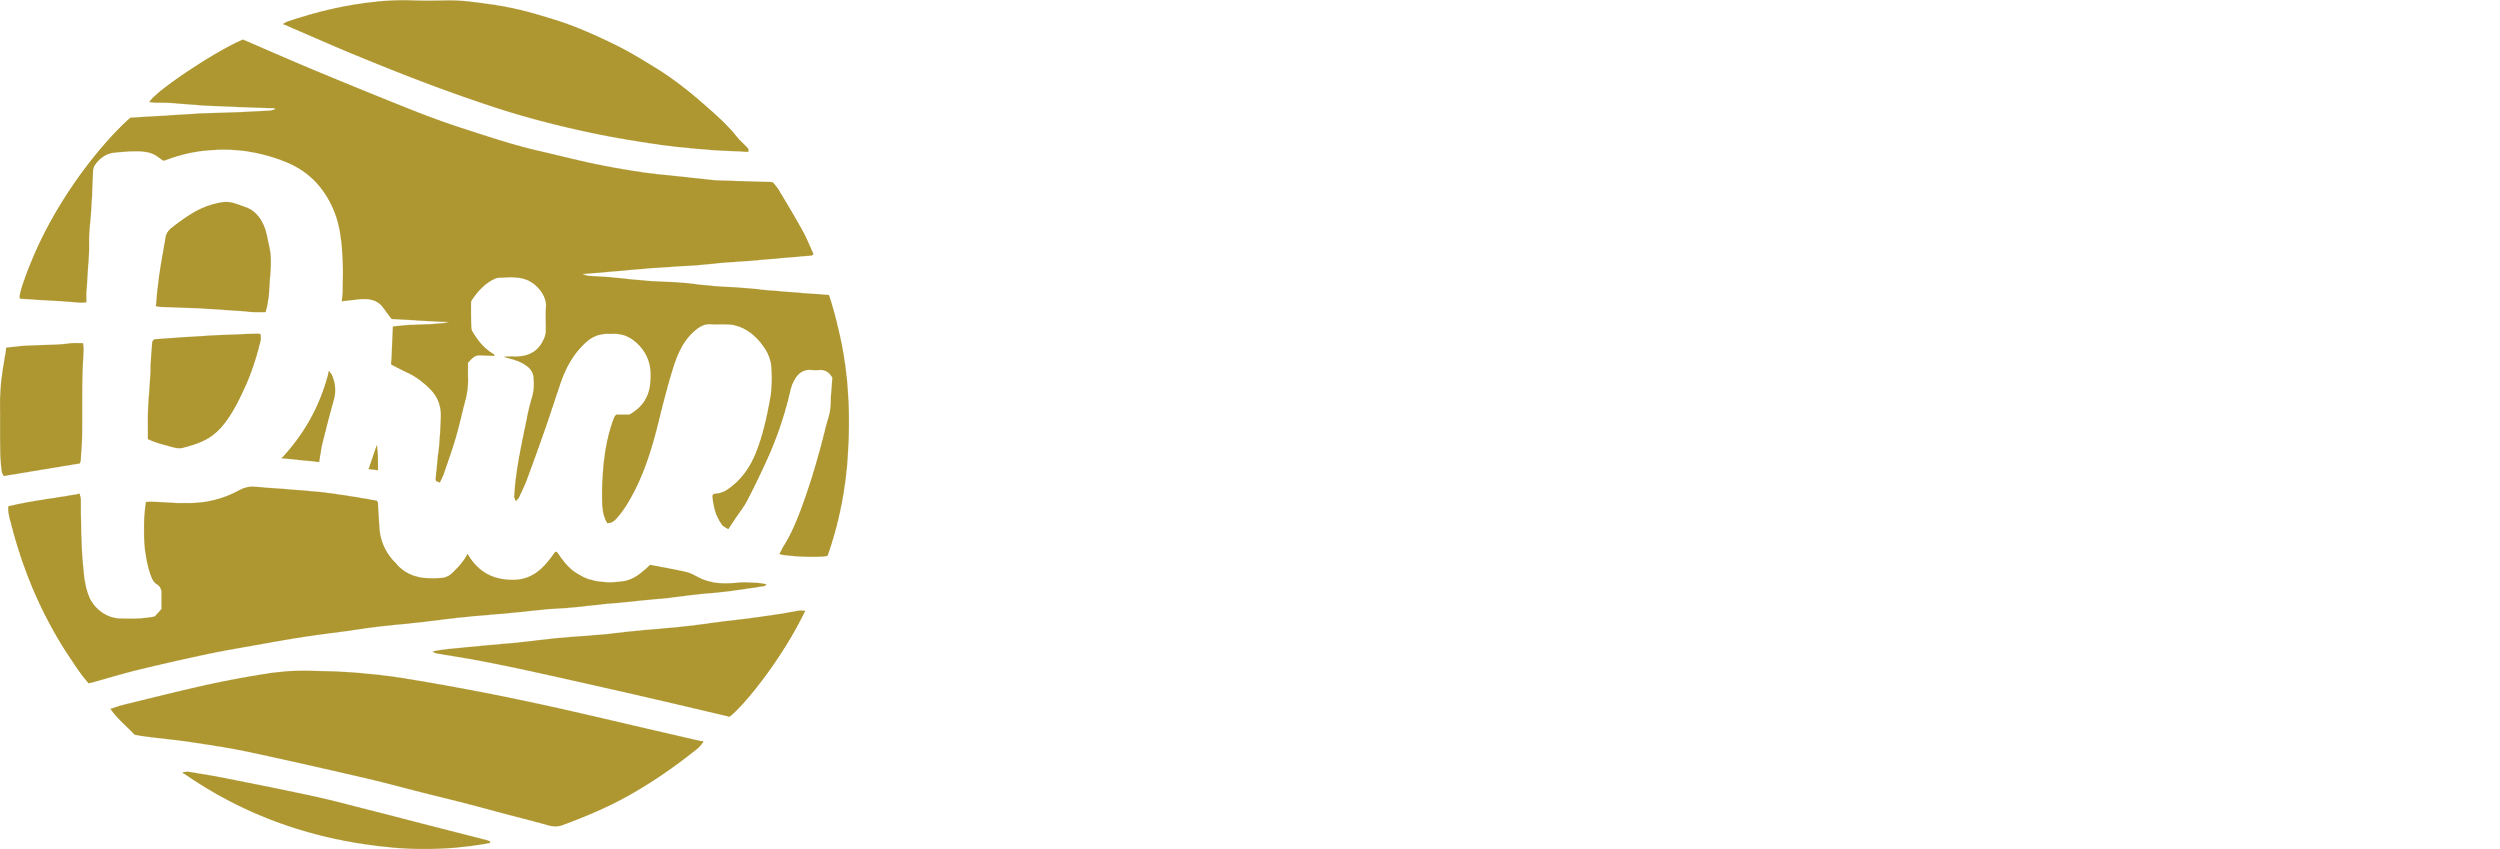 Price Landscaping & Lawn Maintenance